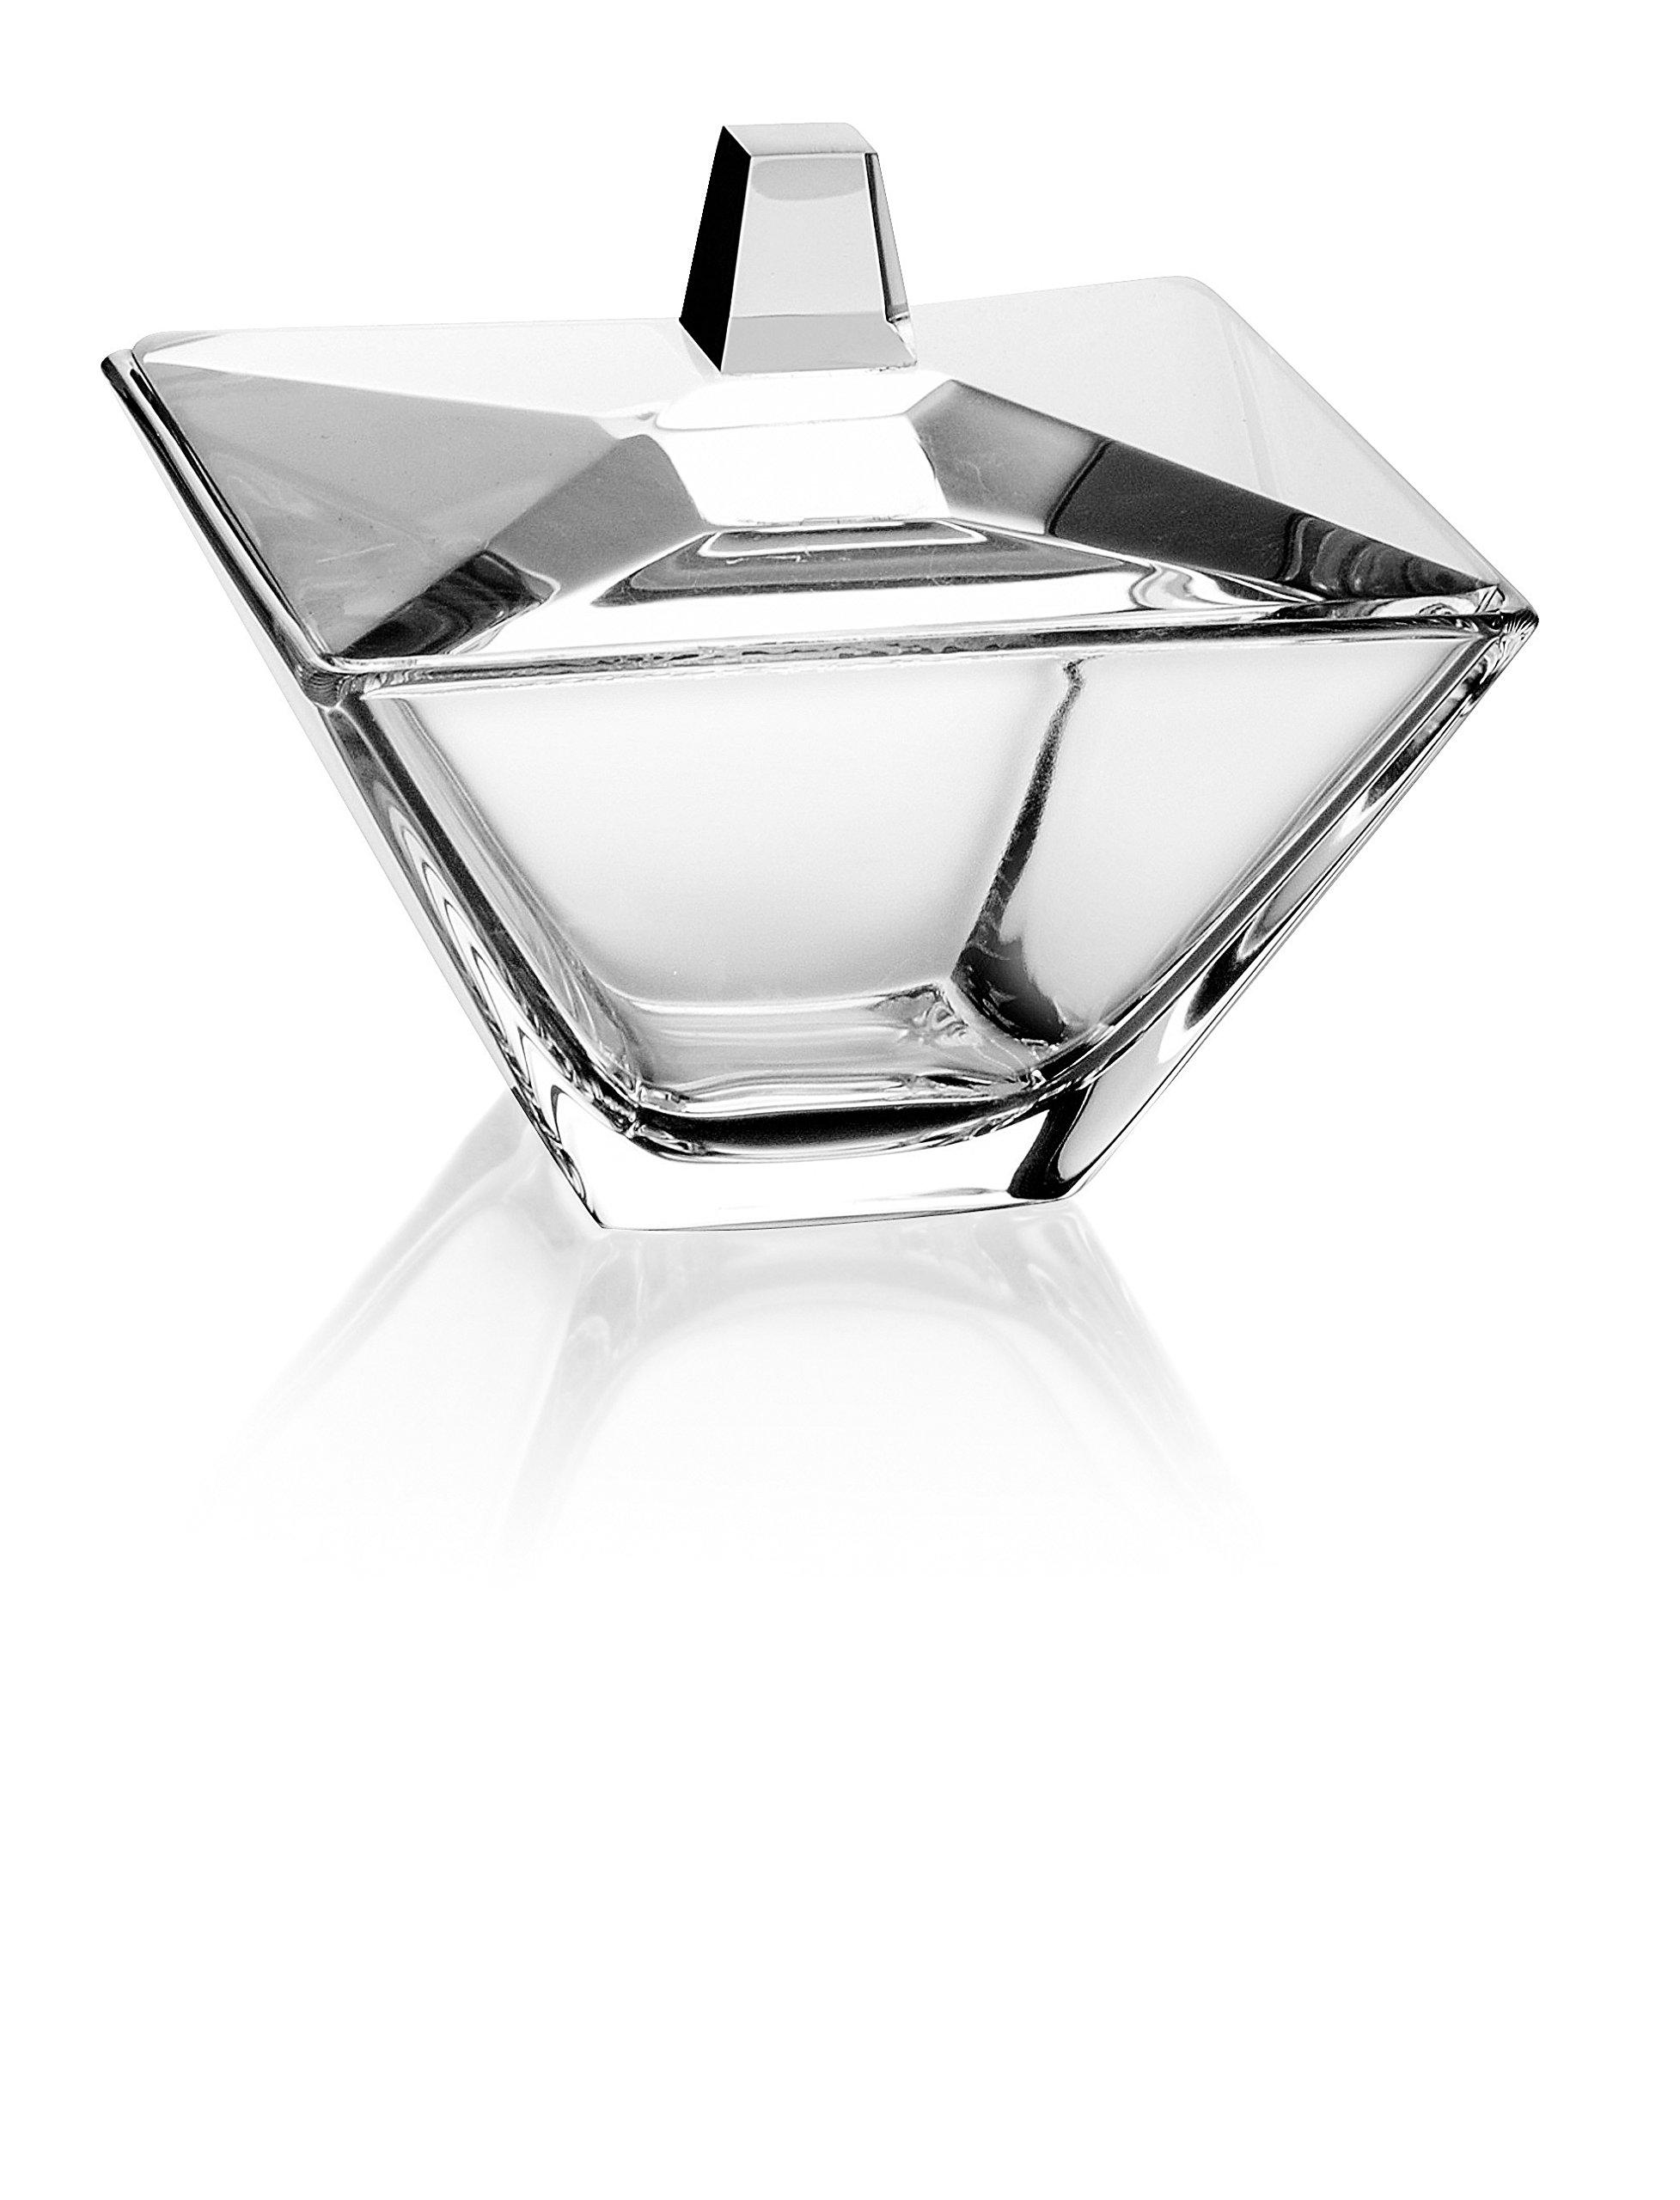 Barski - European Glass - Square - Covered - Candy - Nut - Chocolate - Jewelry - Box - 4.2'' Diameter - Made in Europe